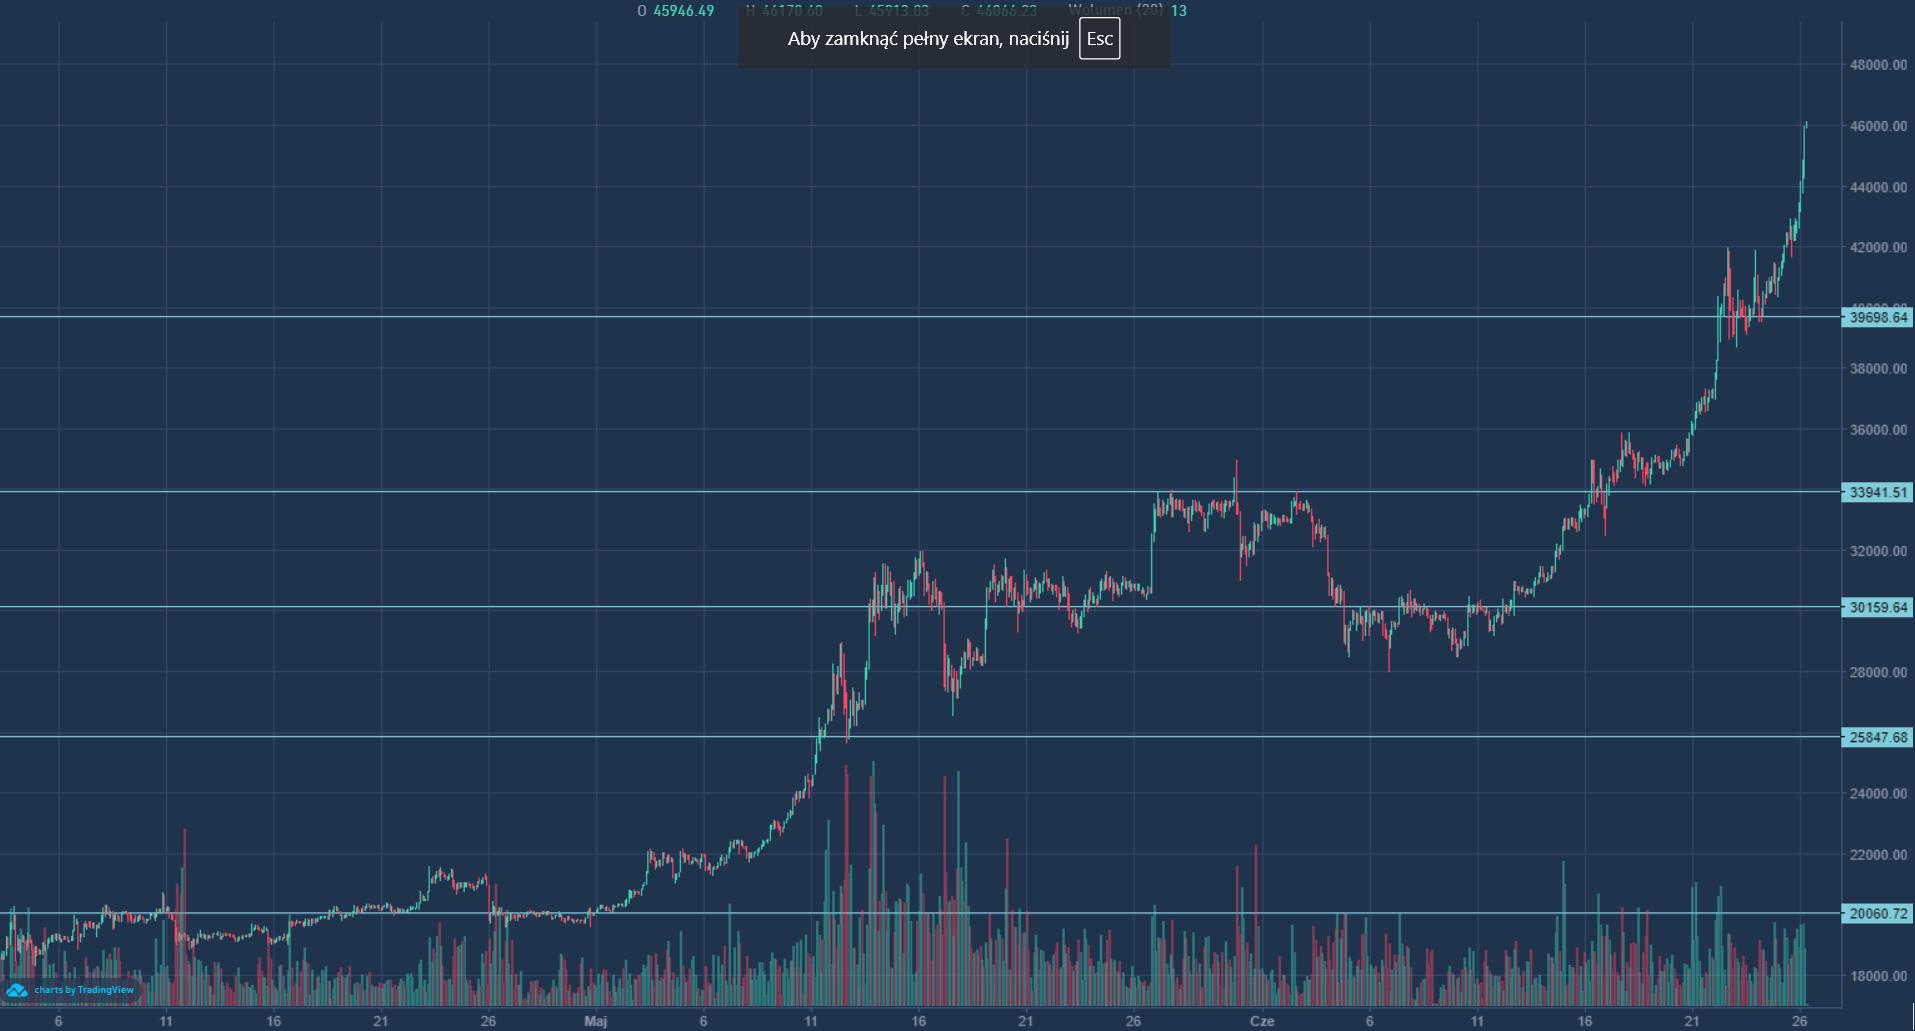 Wzrost ceny bitcoina w maju